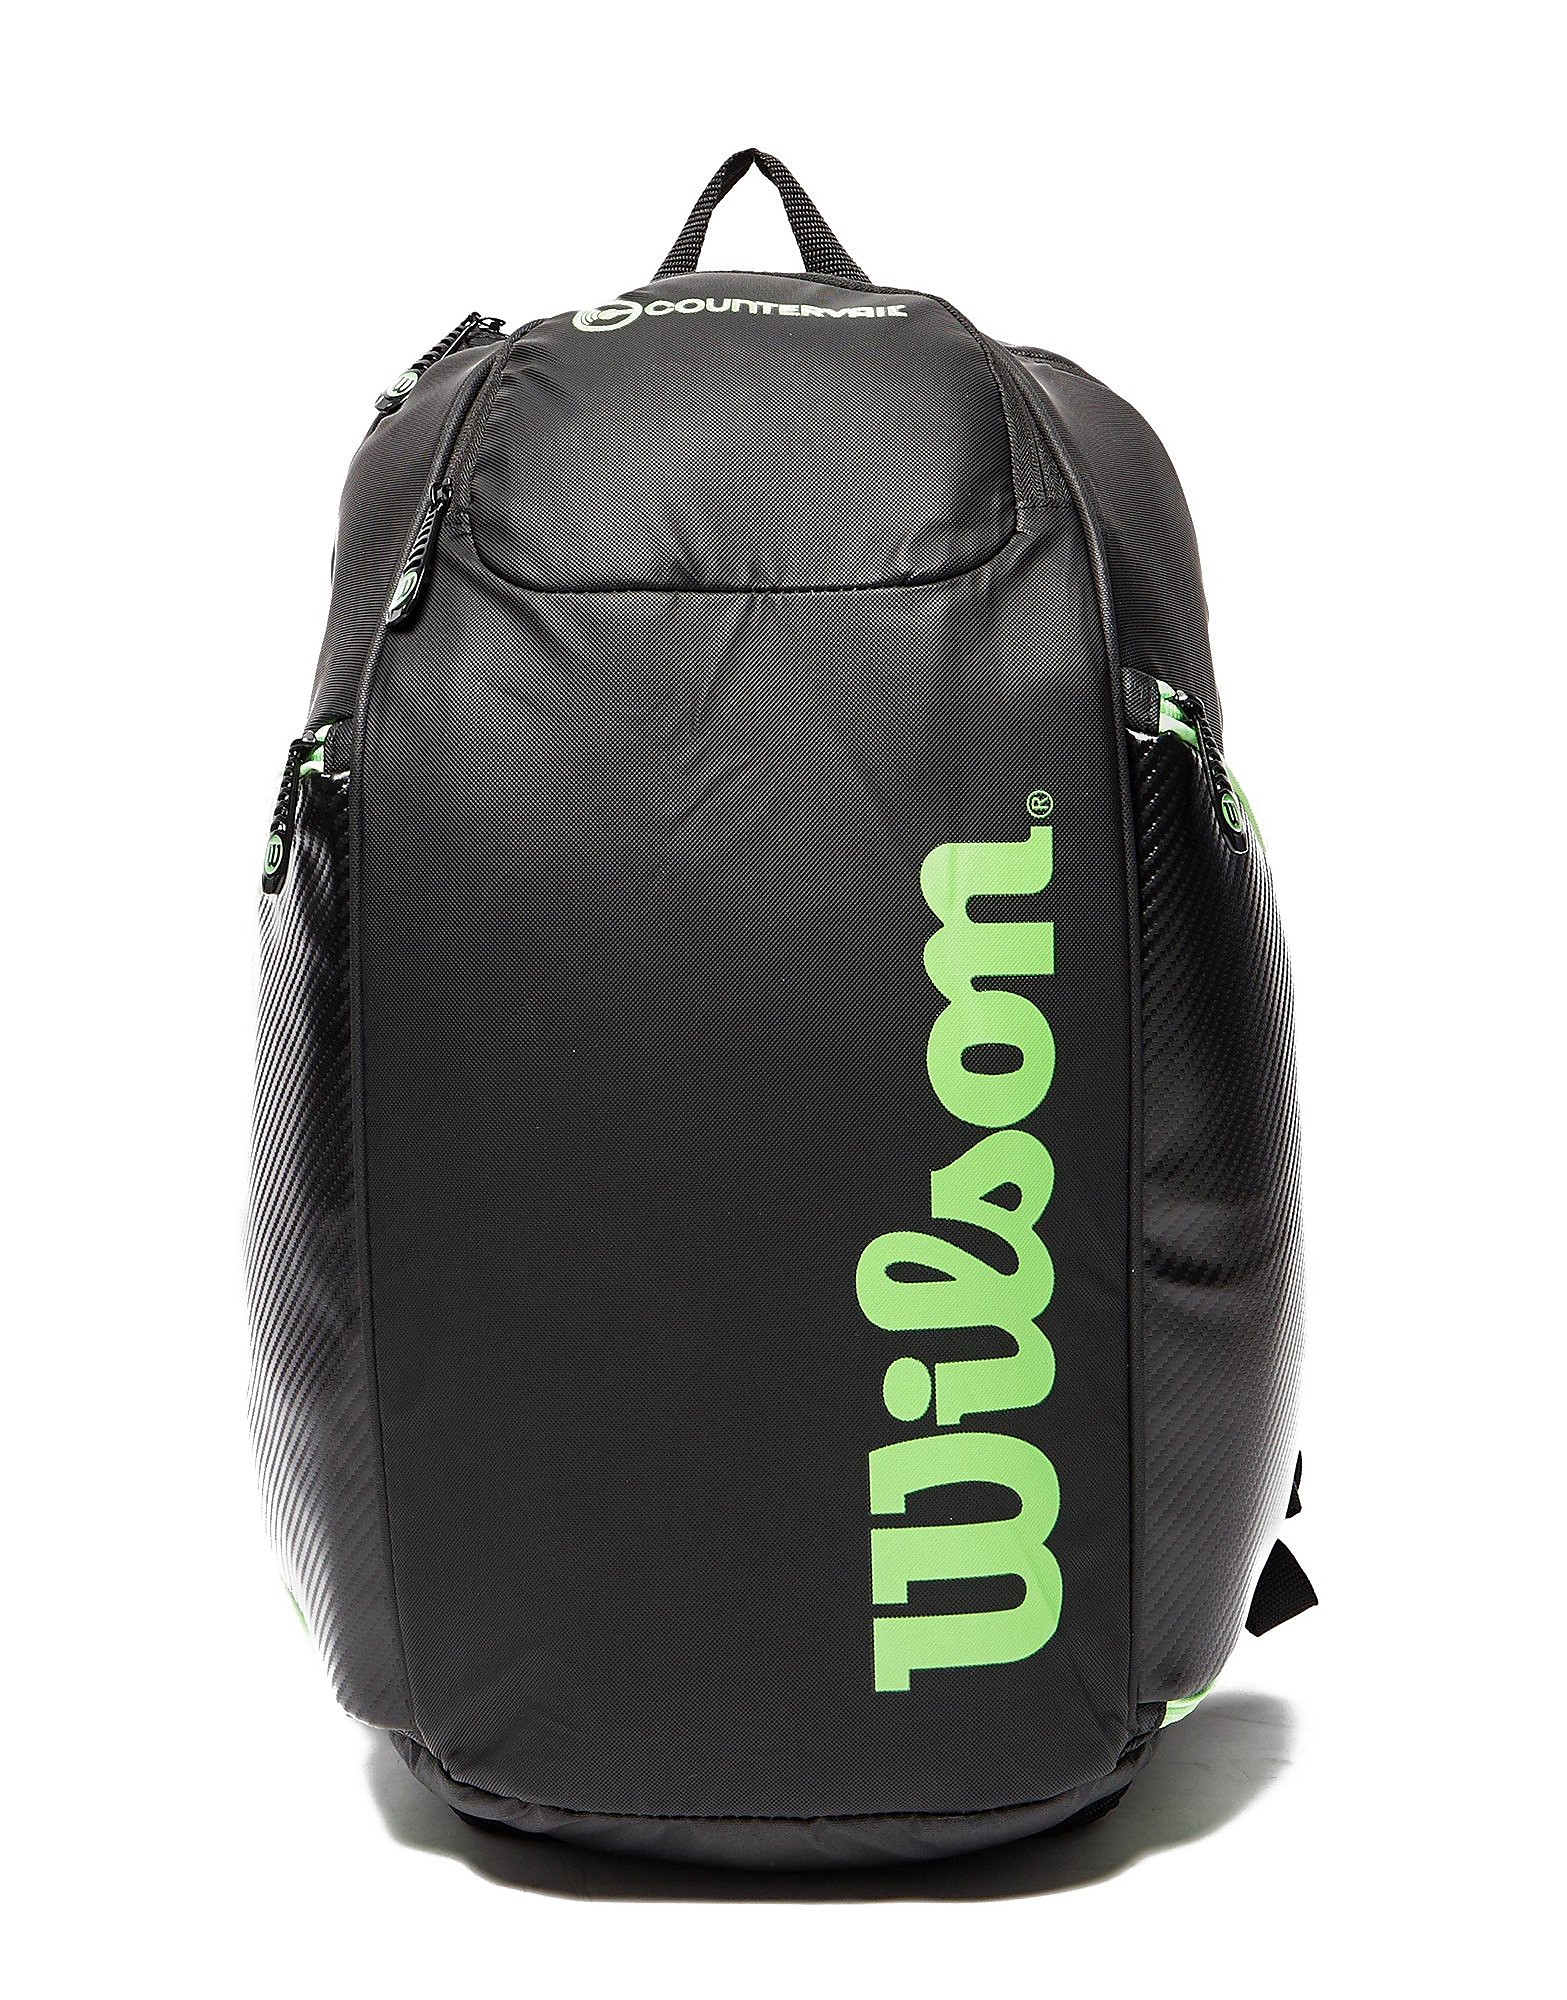 Wilson Vancouver Junior Tennis Backpack